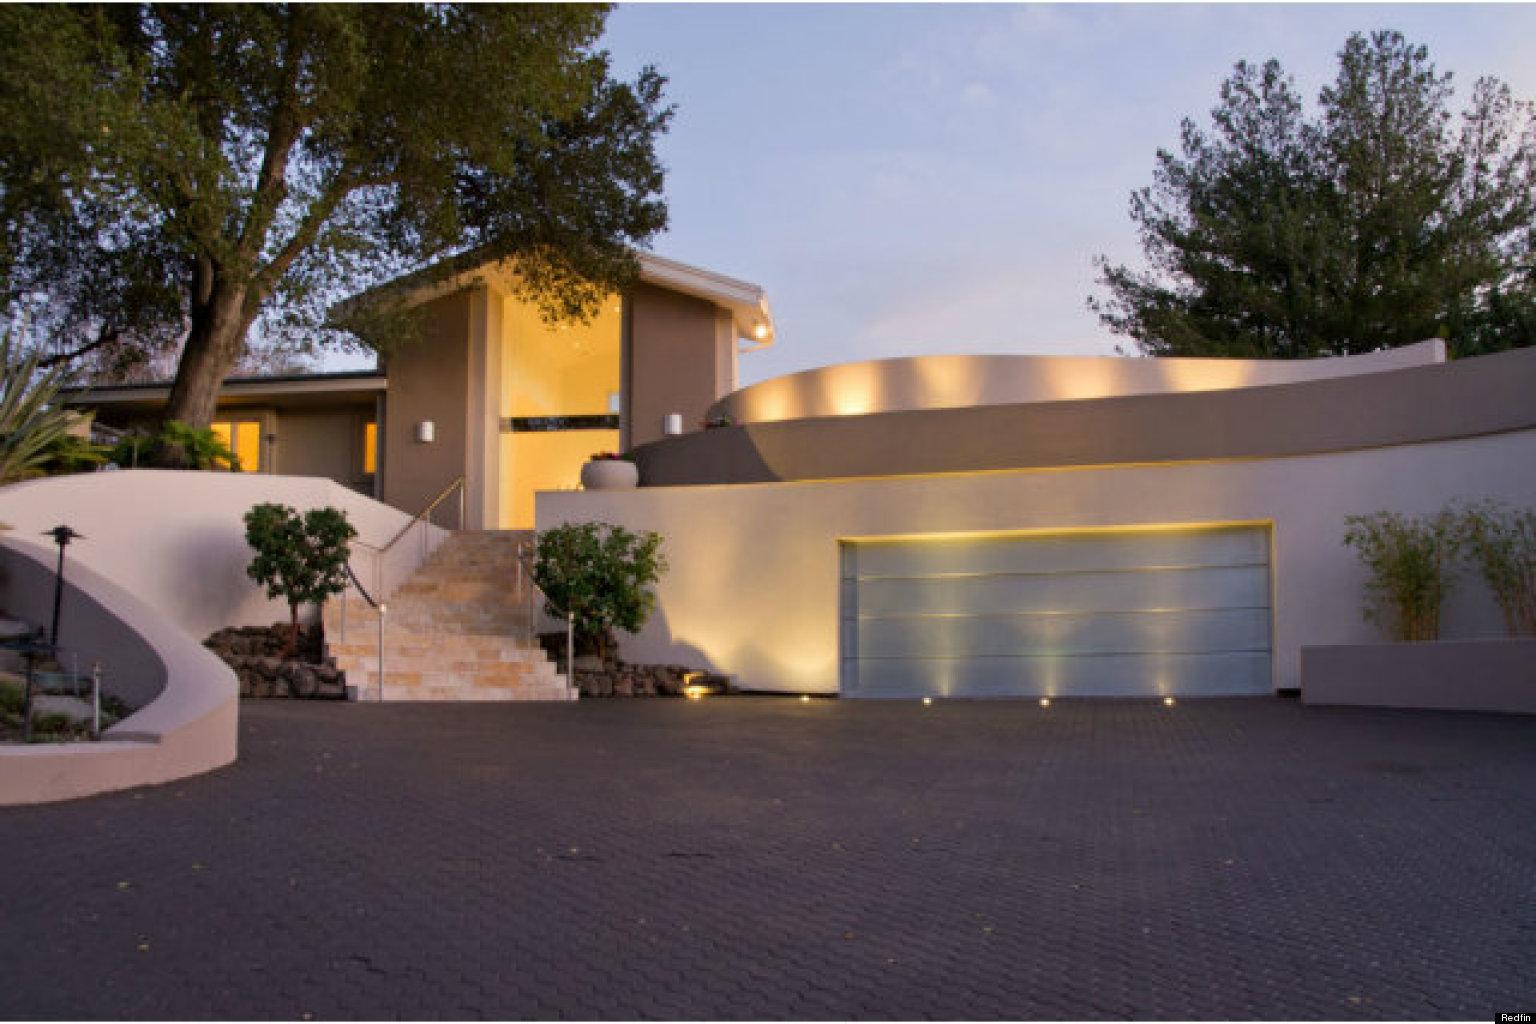 Steve Wozniak's Former Home Hits The Market (PHOTOS) | HuffPost on window house night, water house night, bathroom night, bedroom night, kitchen night, home house night, landscaping house night,